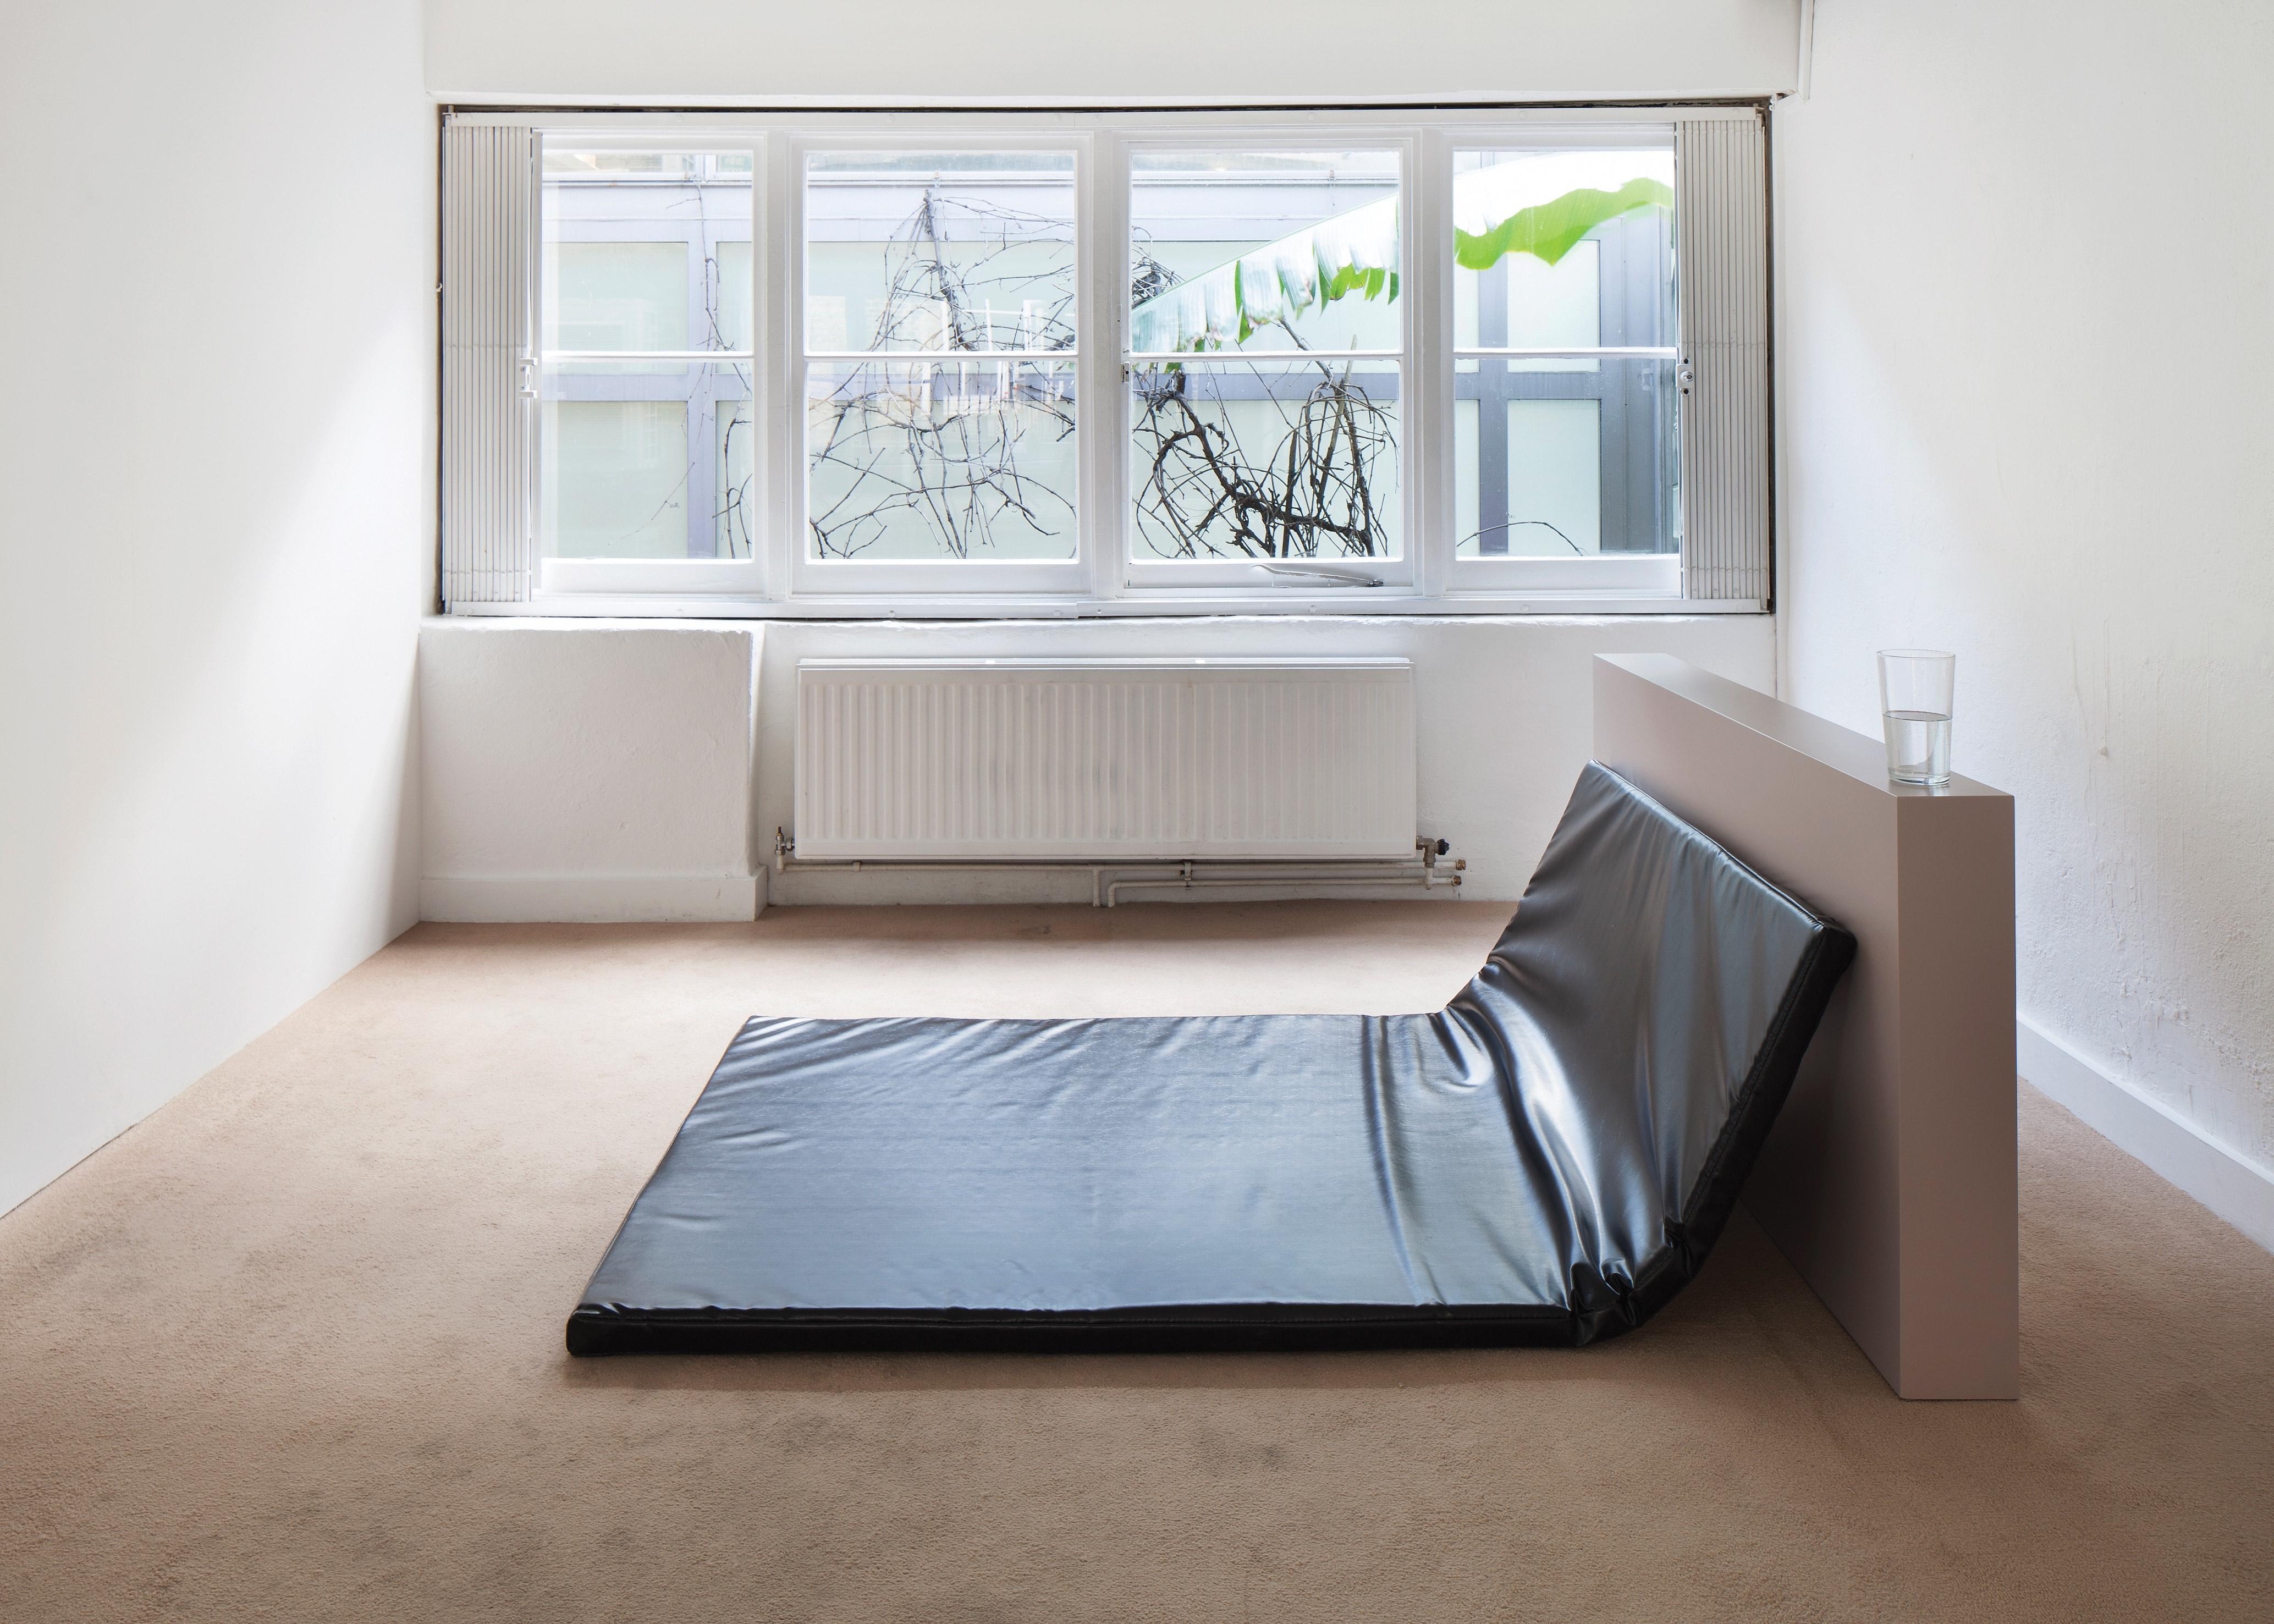 Player, 2013 Prem Sahib London artist minimalism club culture bed sculpture